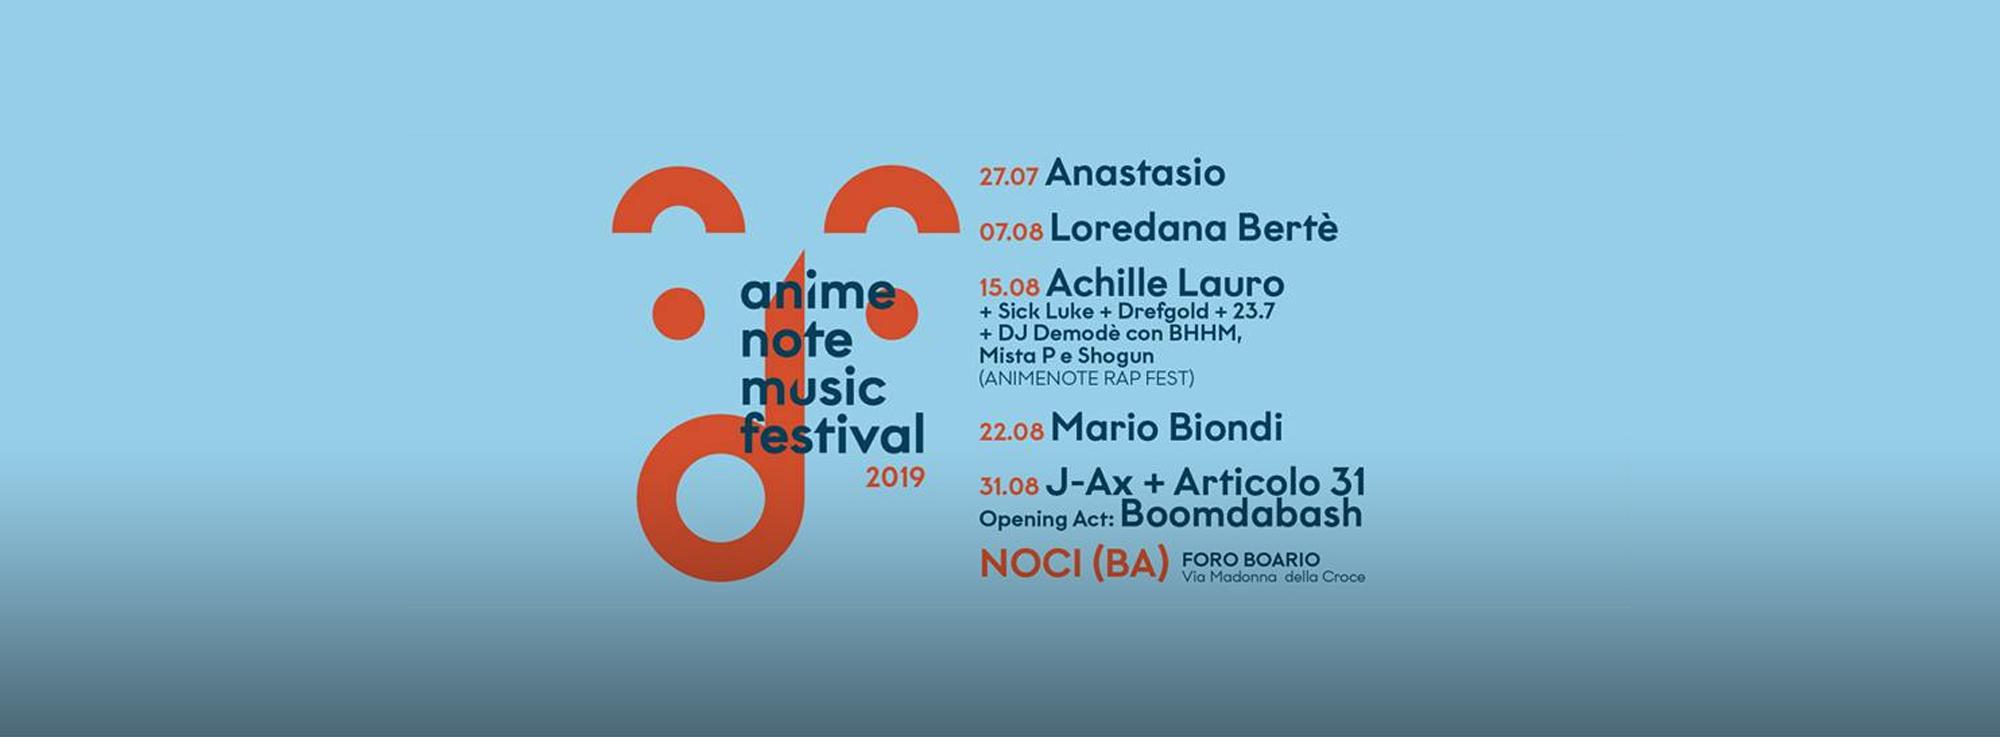 Noci: Anime Note Music Festival